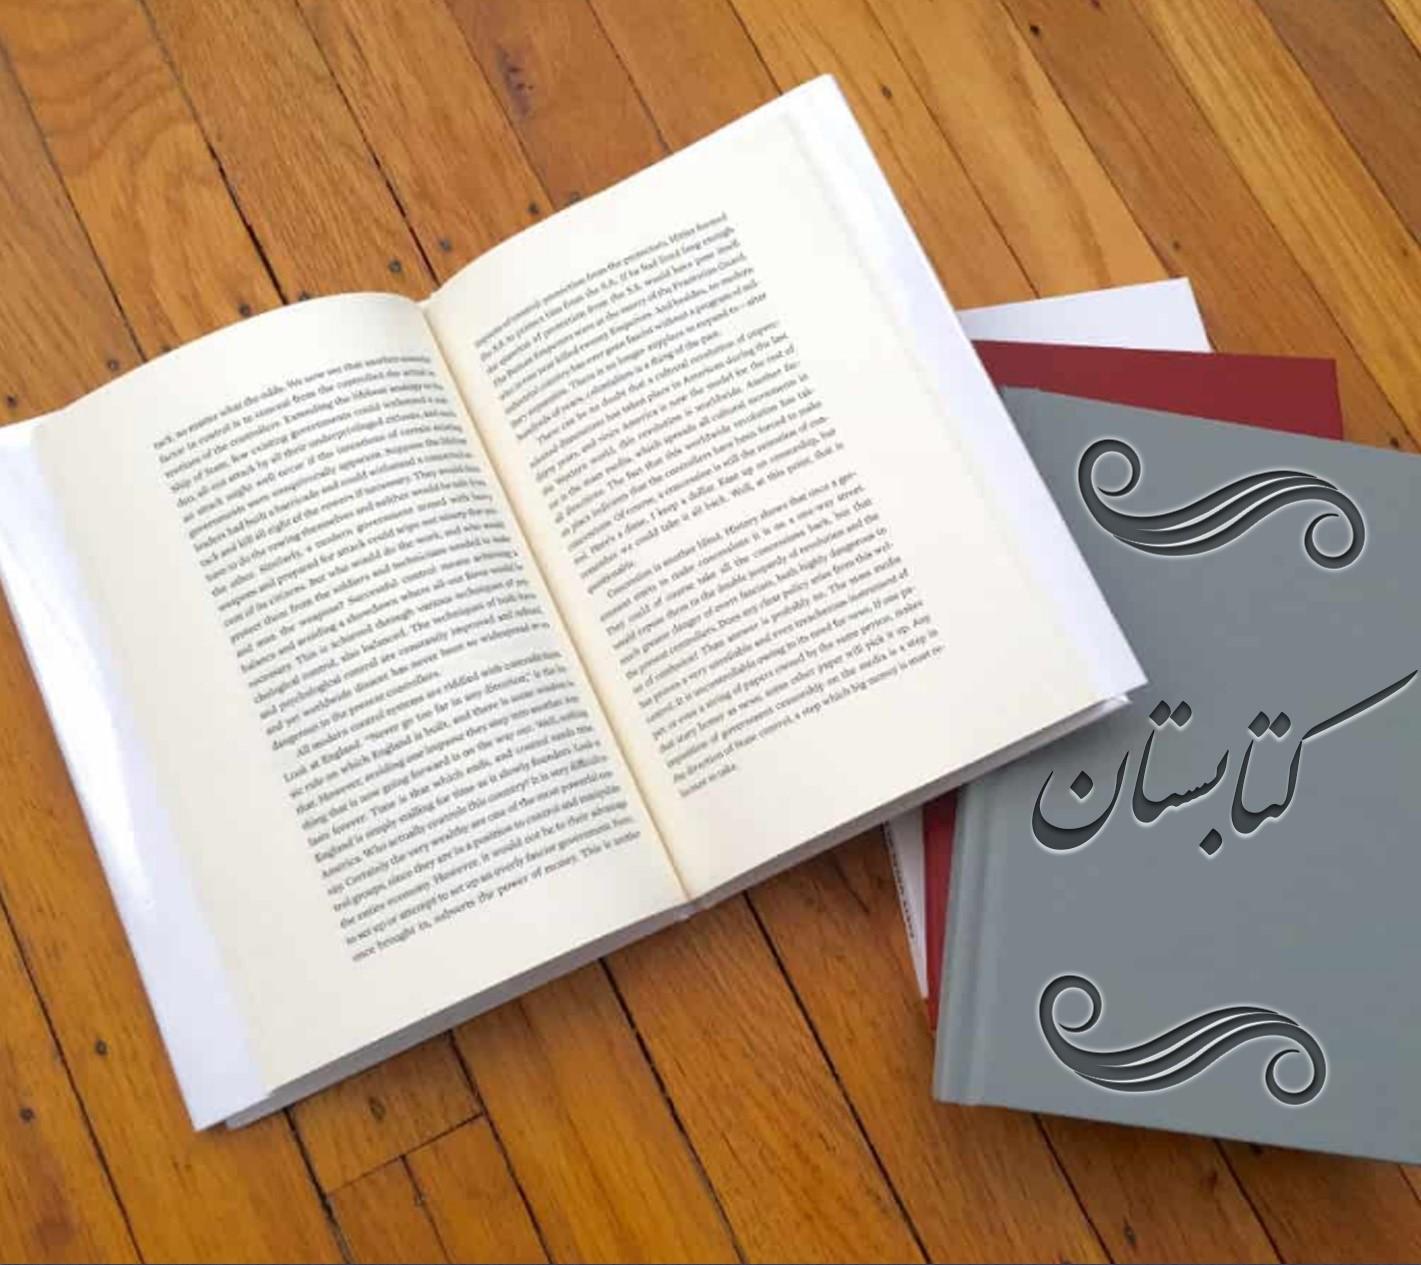 مرکز چاپ کتاب در انتشارات قم